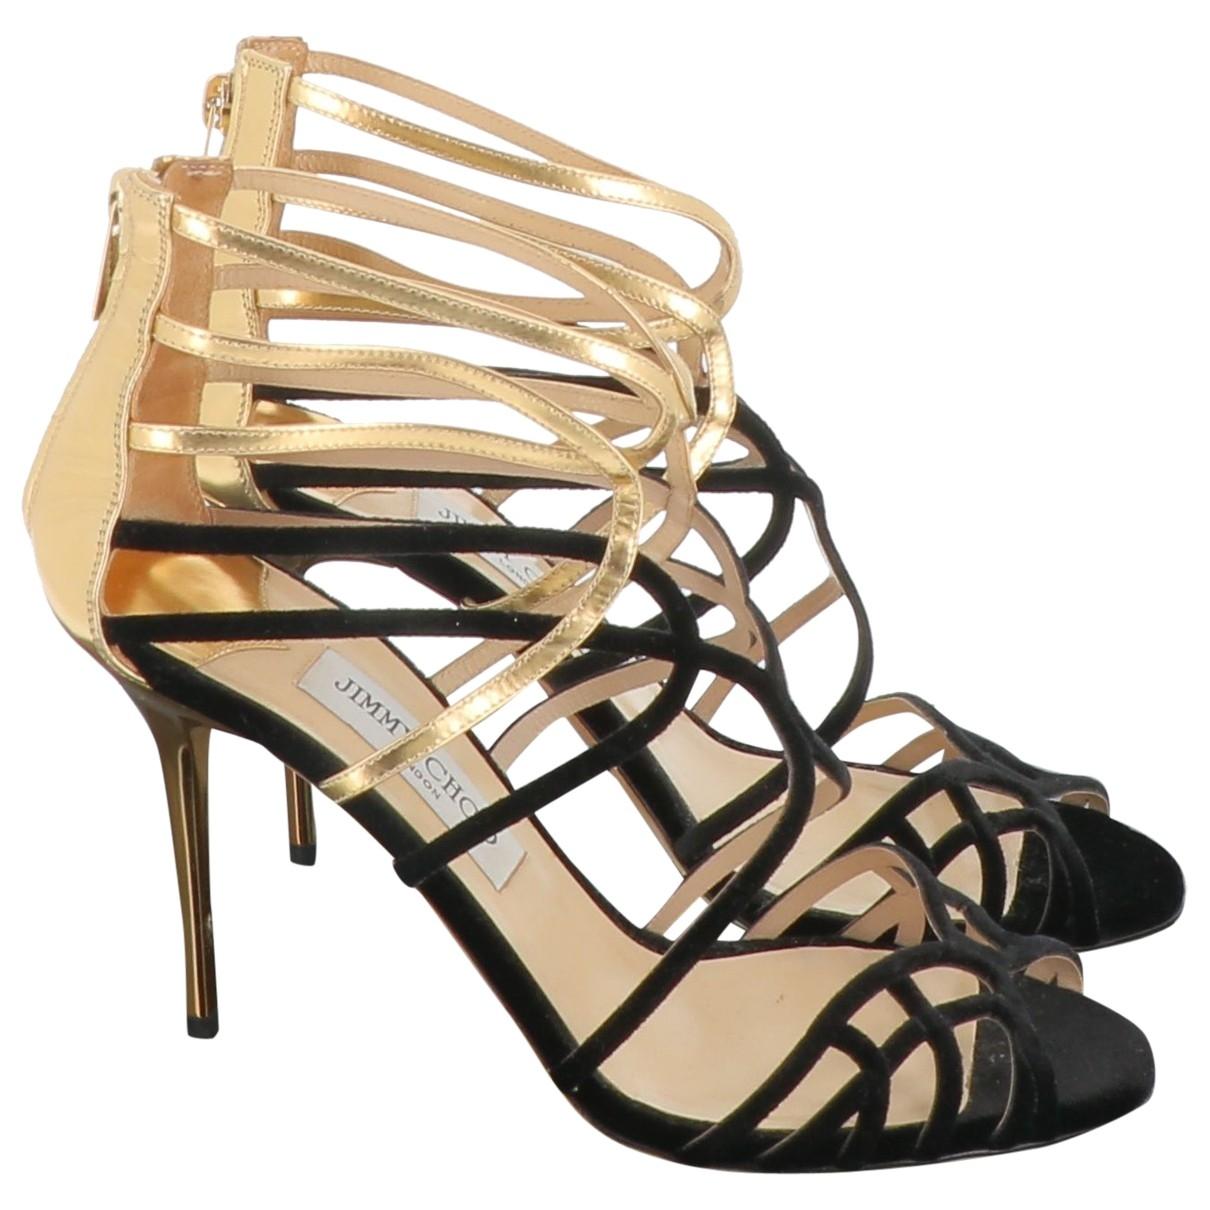 Jimmy Choo \N Black Suede Sandals for Women 39.5 EU